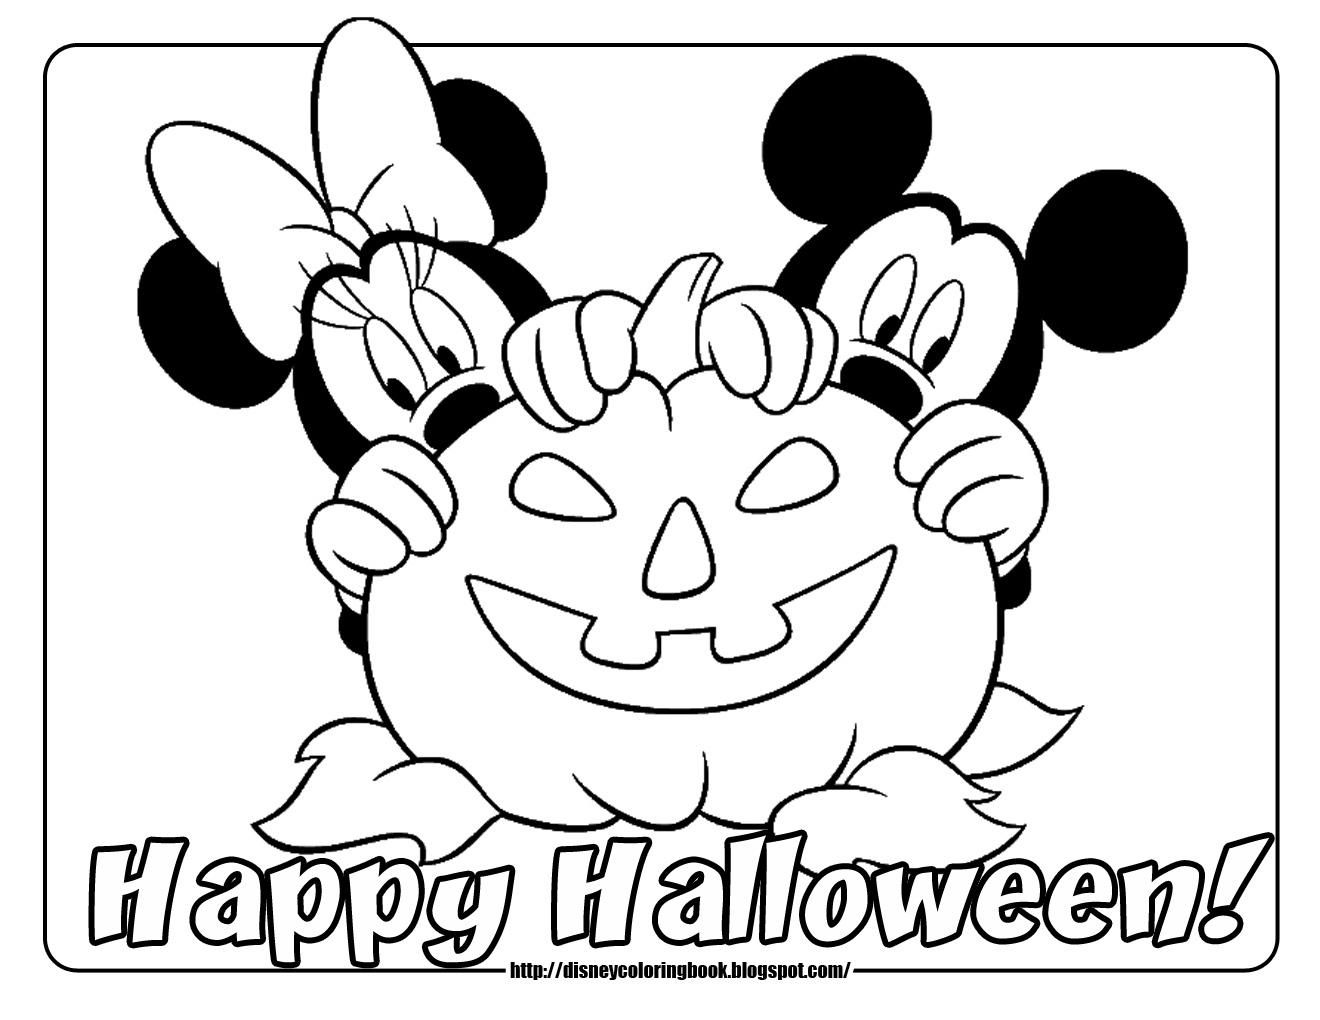 1320x1020 Disney Halloween Coloring Sheets